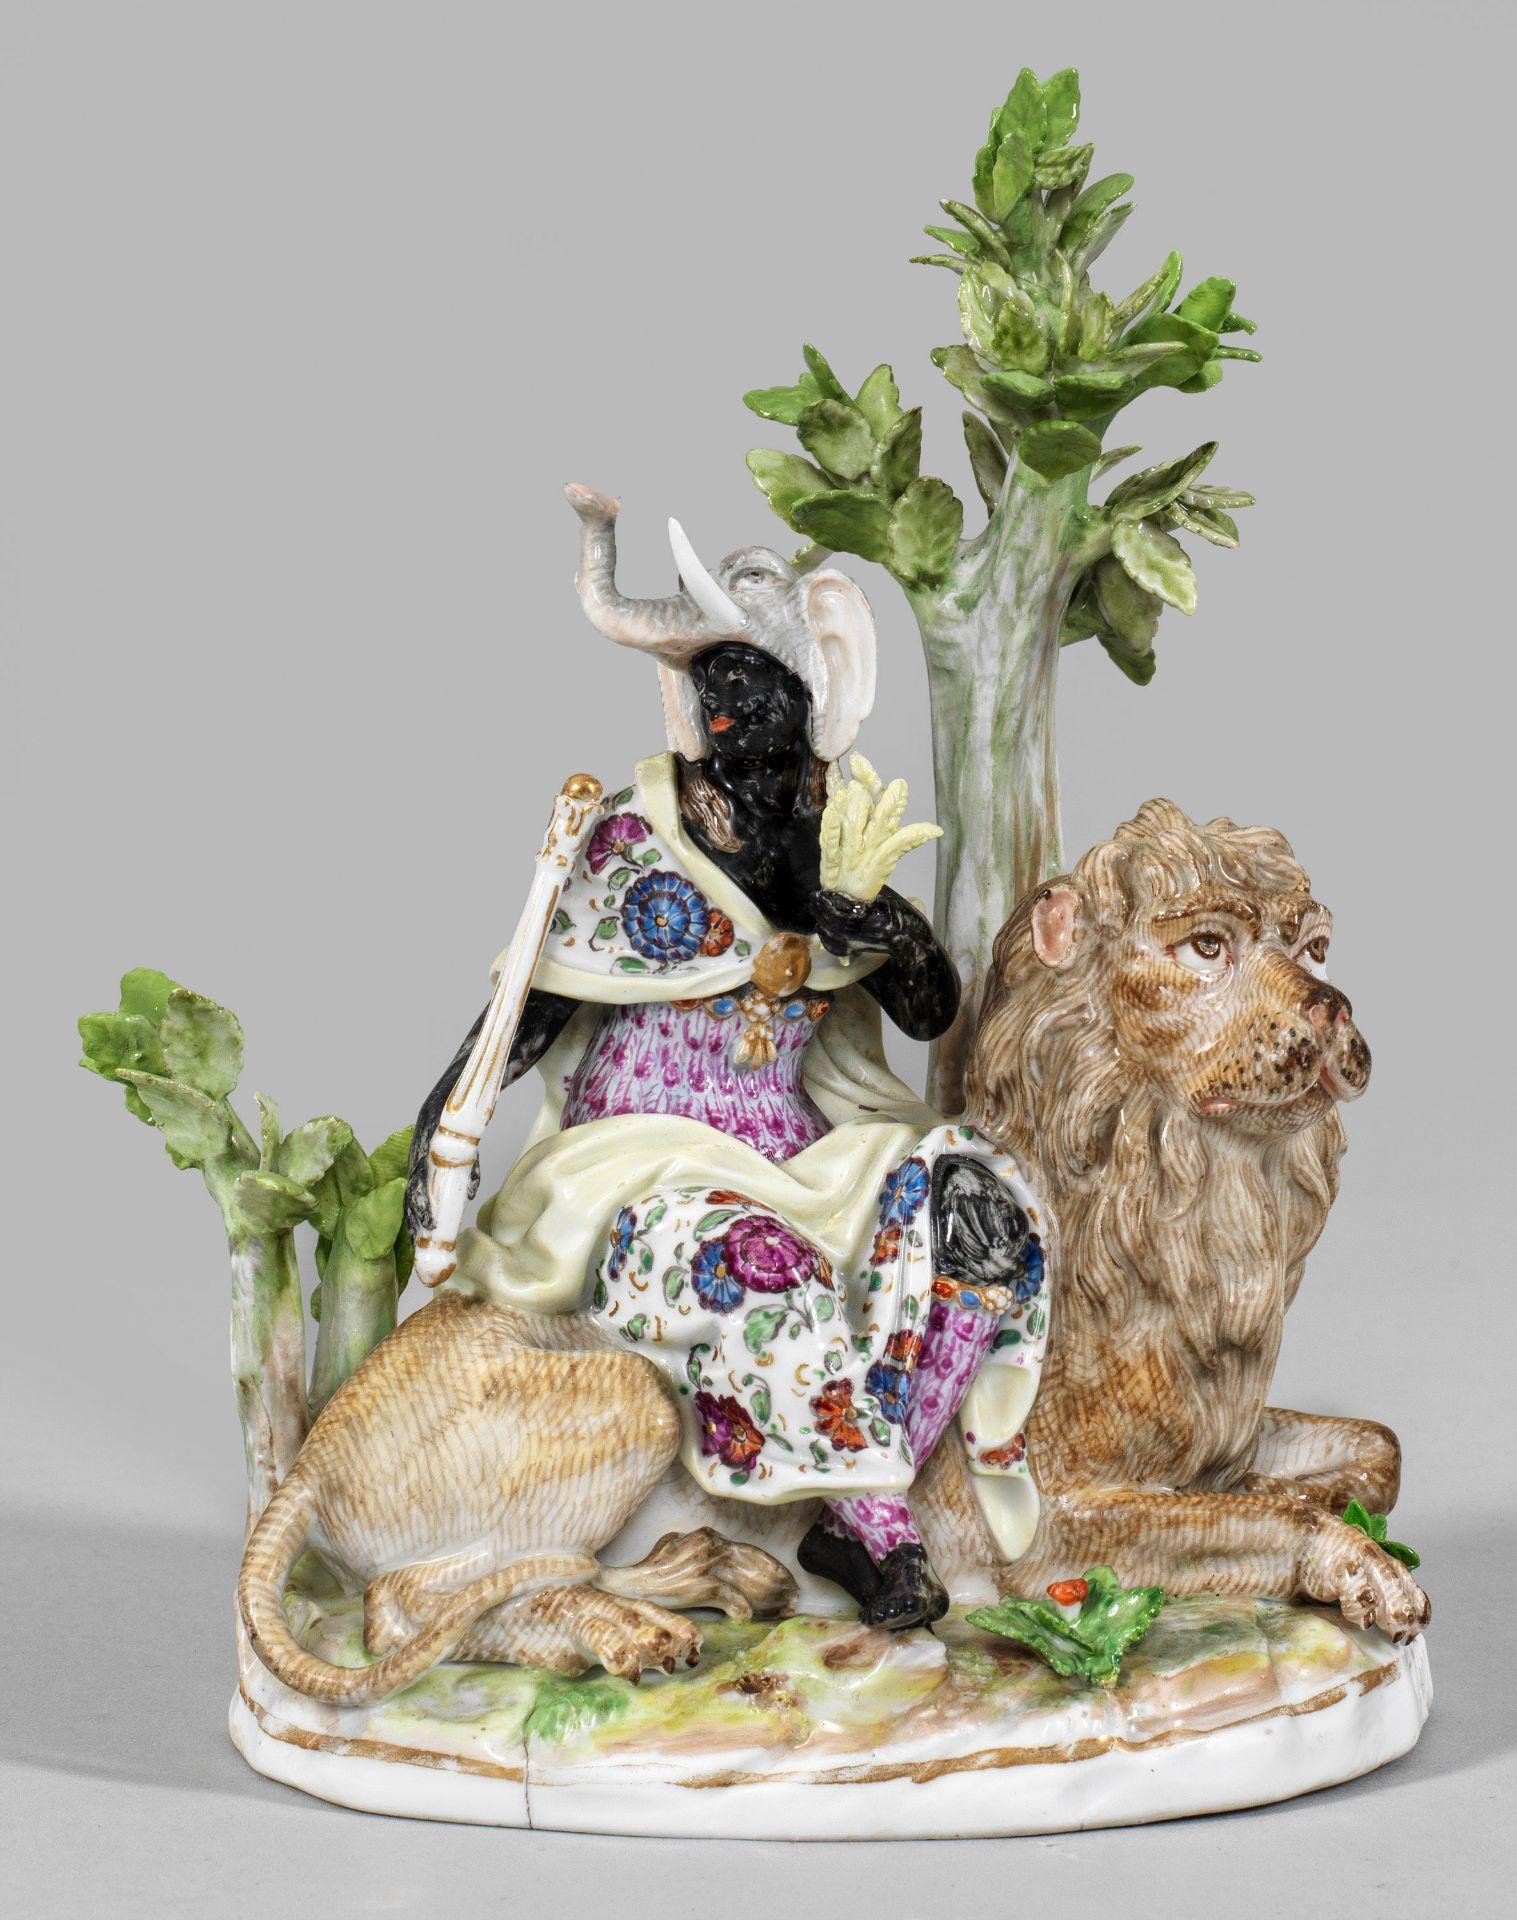 Allegorische Figurengruppe von Afrika